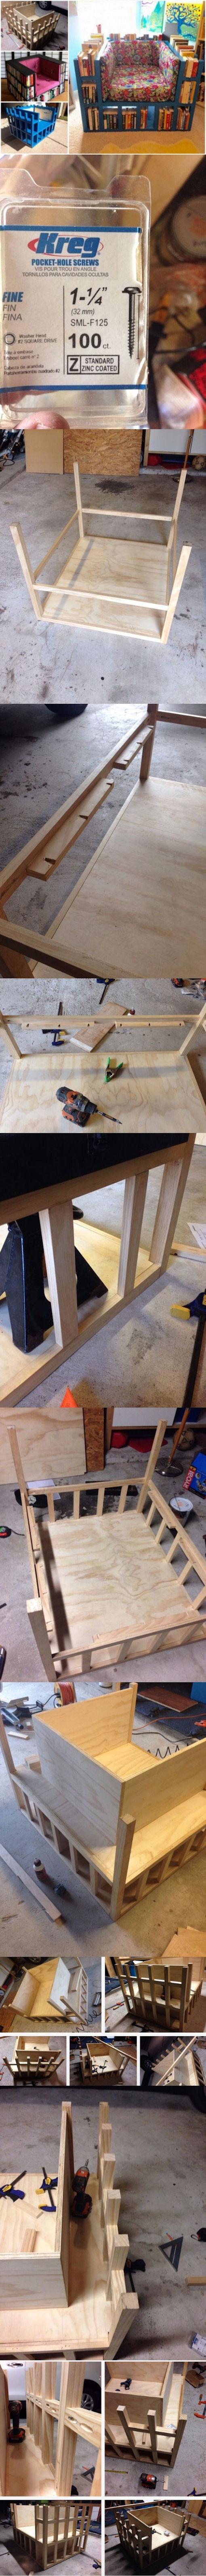 DIY Bookshelf Chair Tutorial